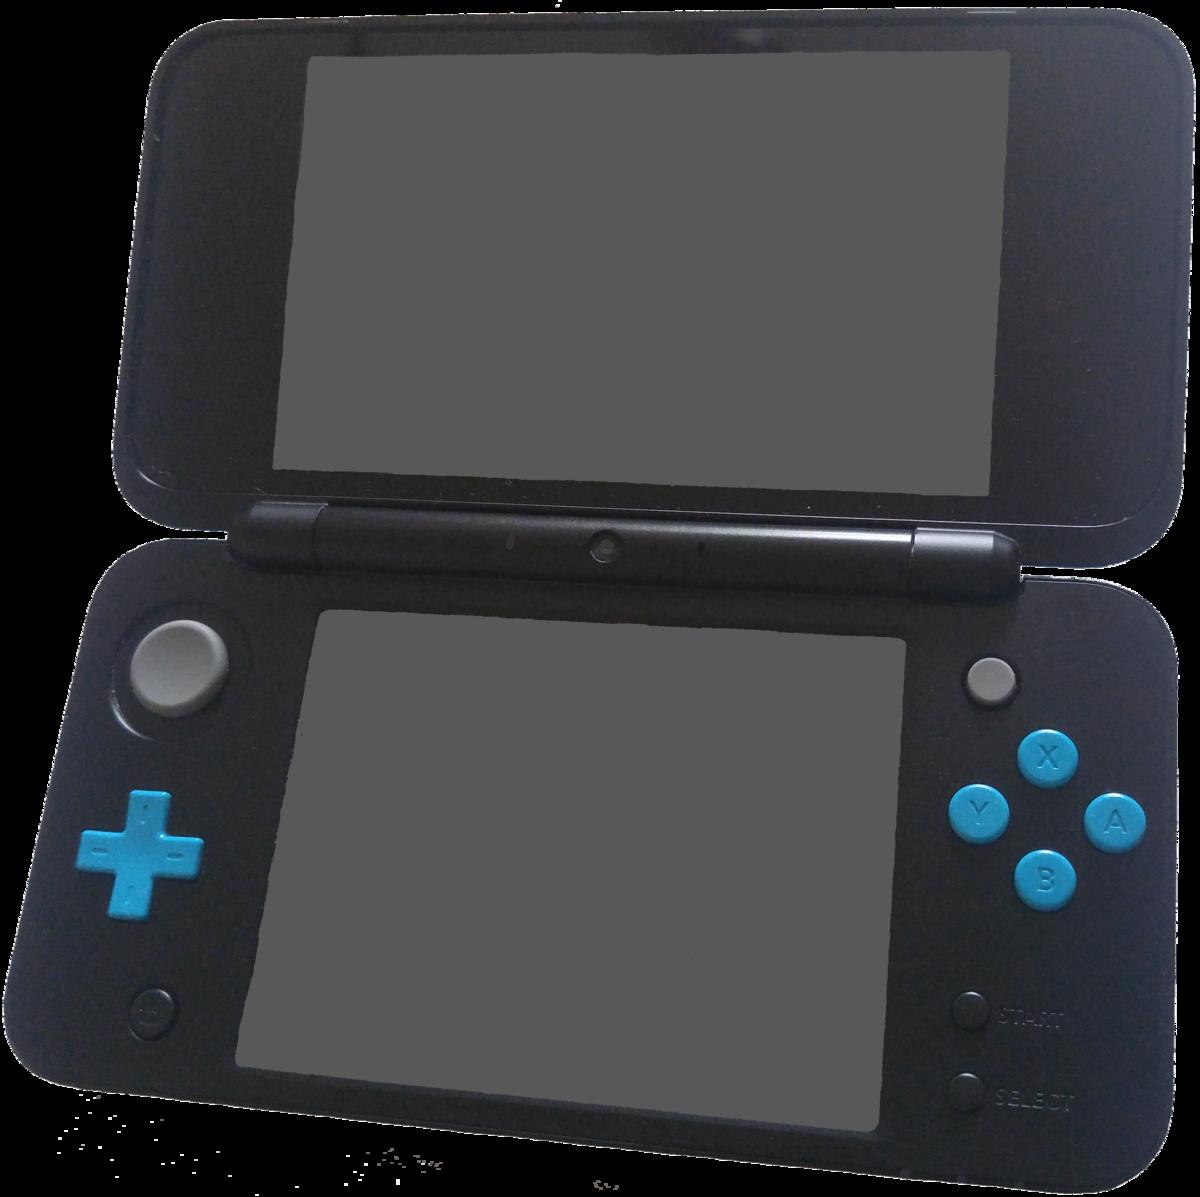 New Nintendo 2DS XL.